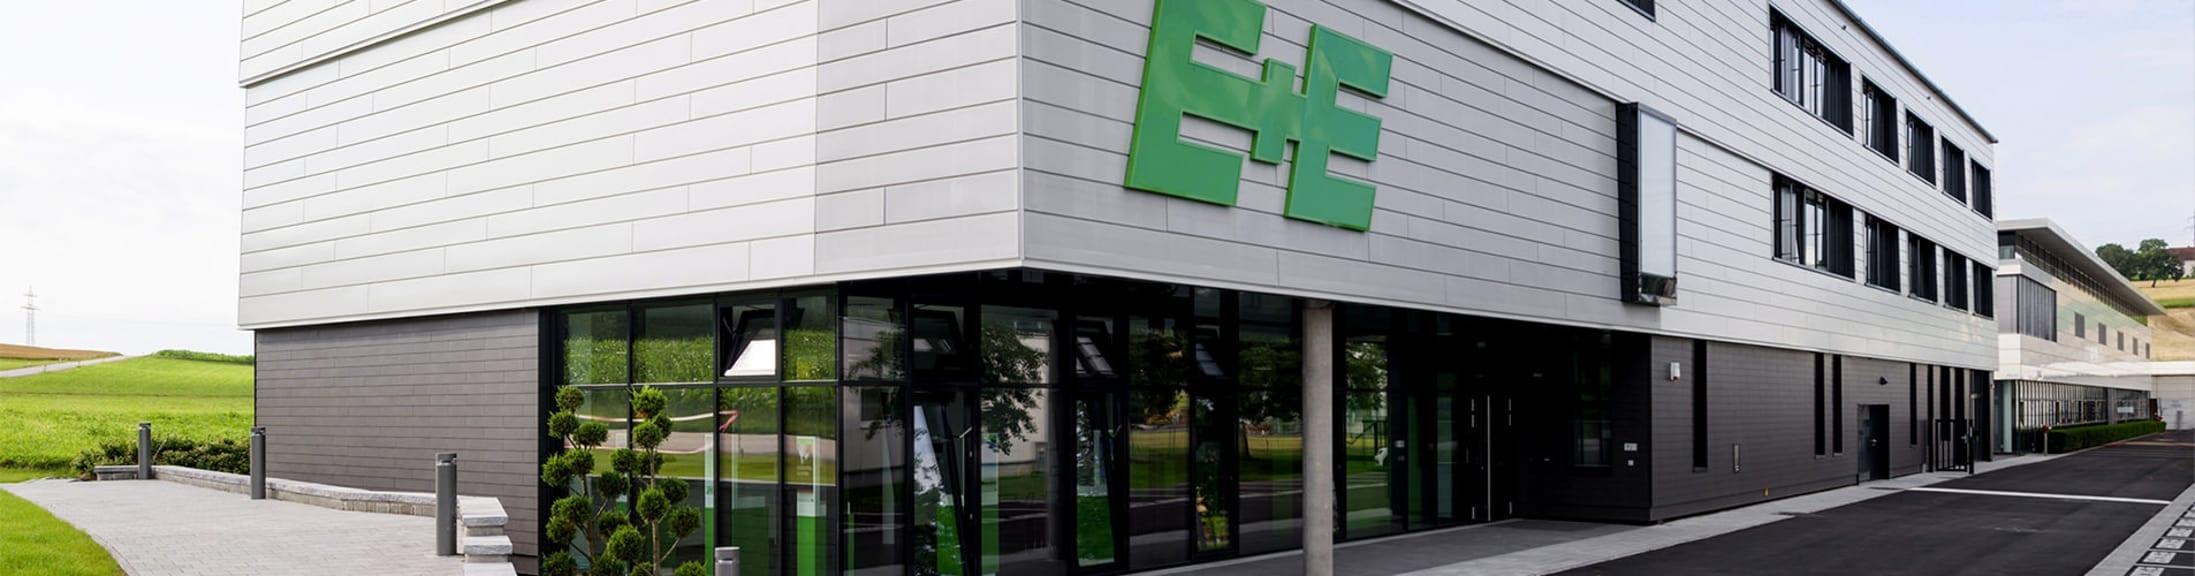 E+E Elektronik Ges.m.b.H. Banner